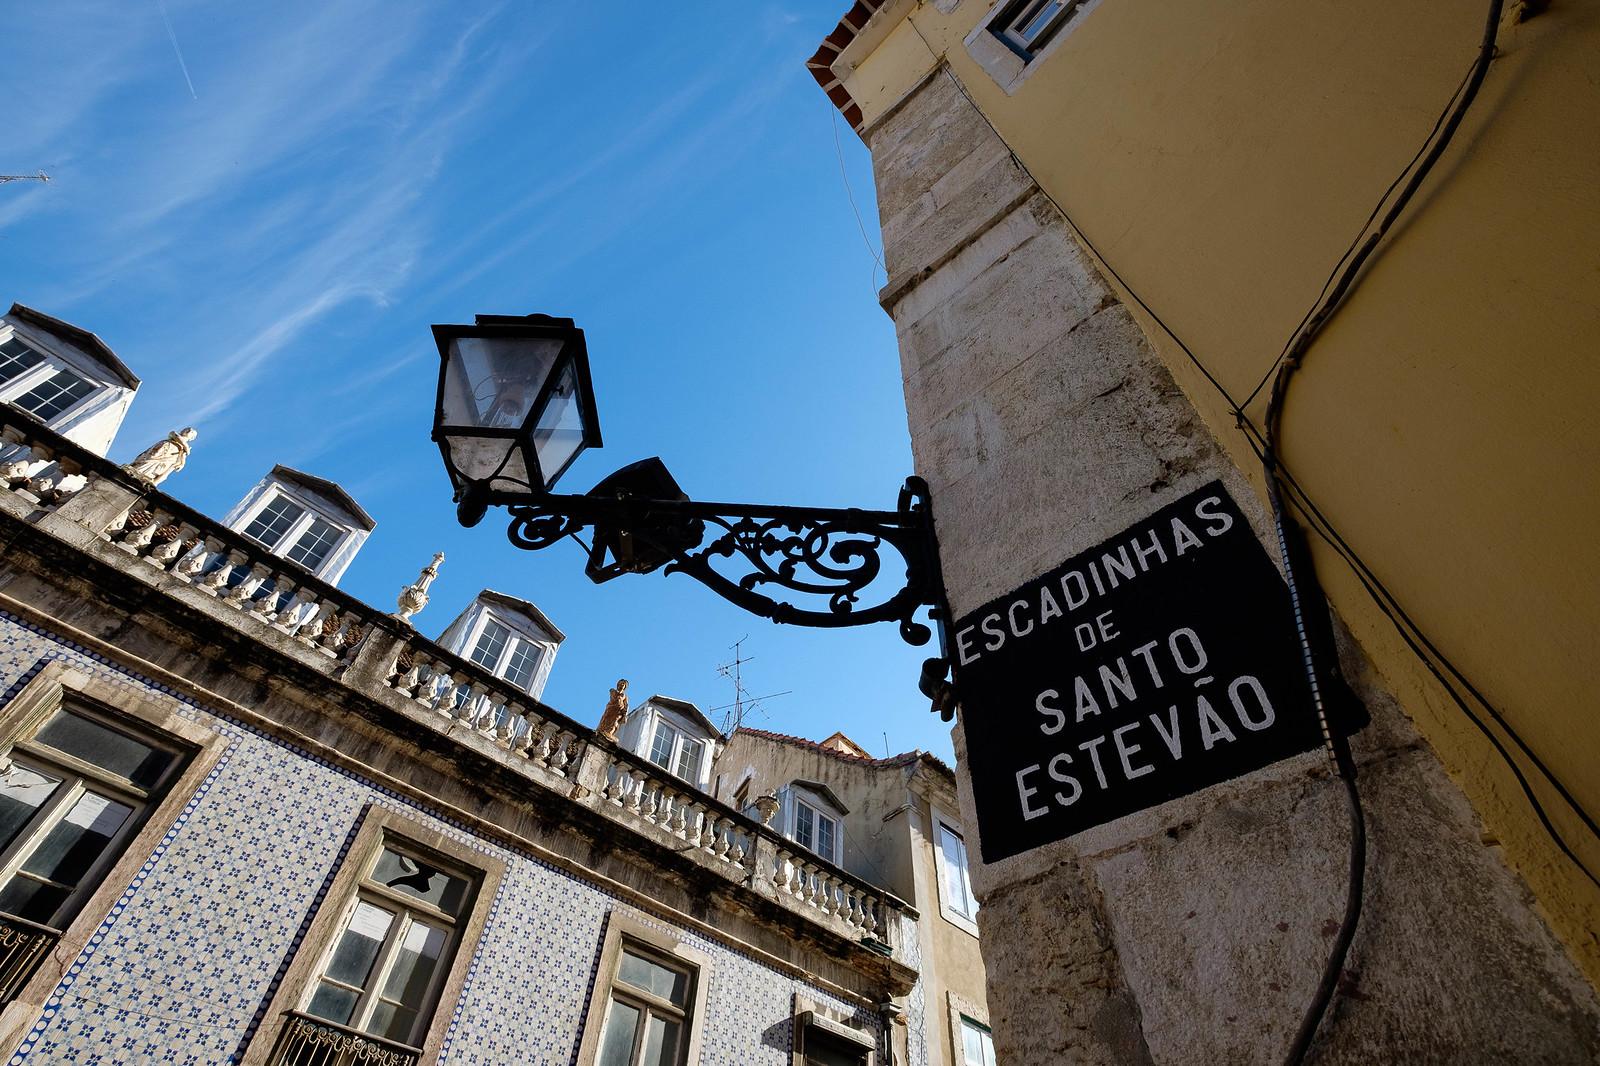 Escadinhas de Santo Estevao - Lisboa